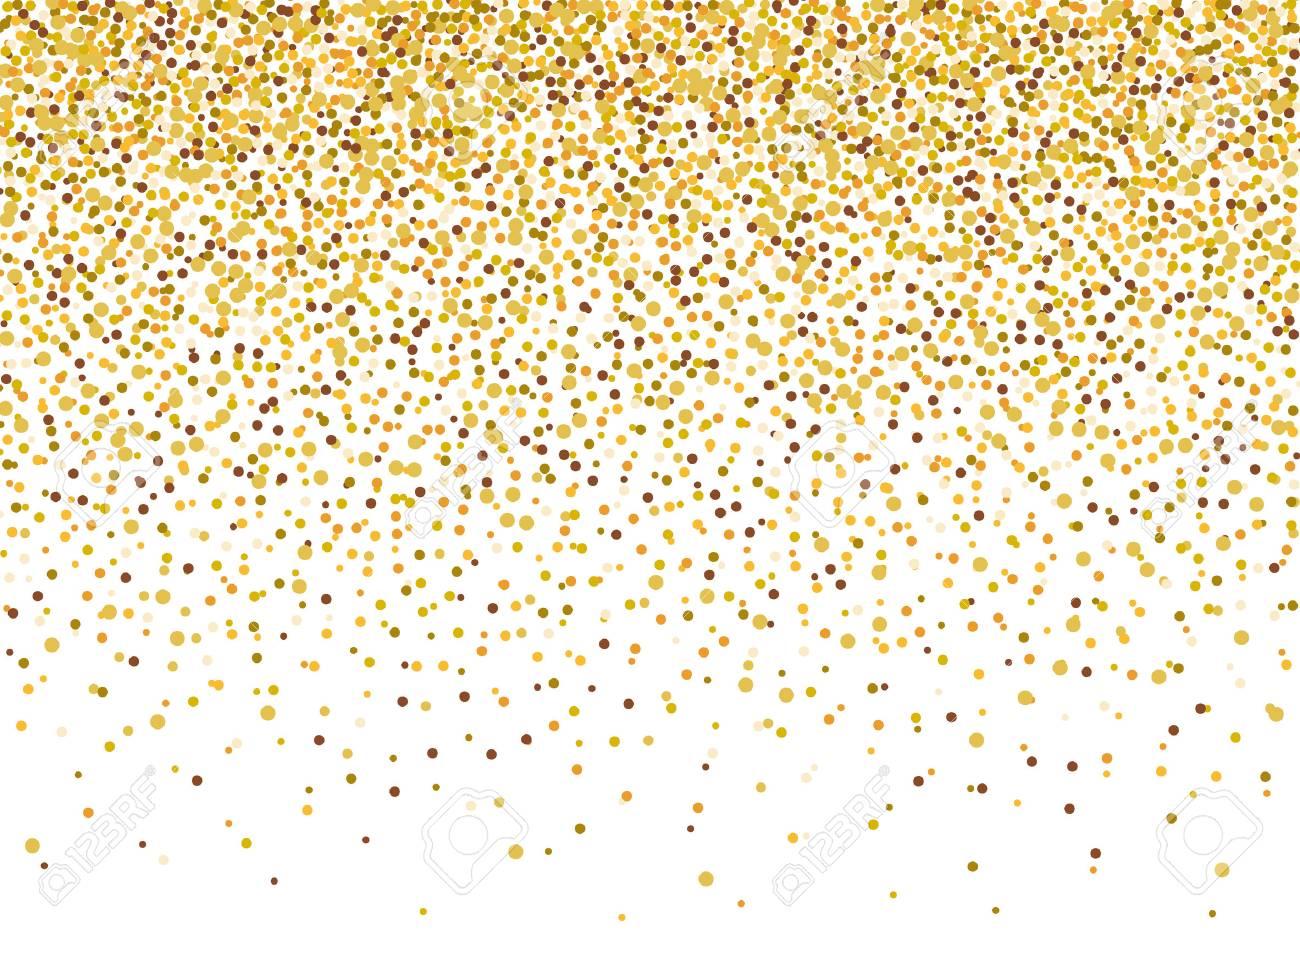 gold glitter confetti frame for festive greeting card template